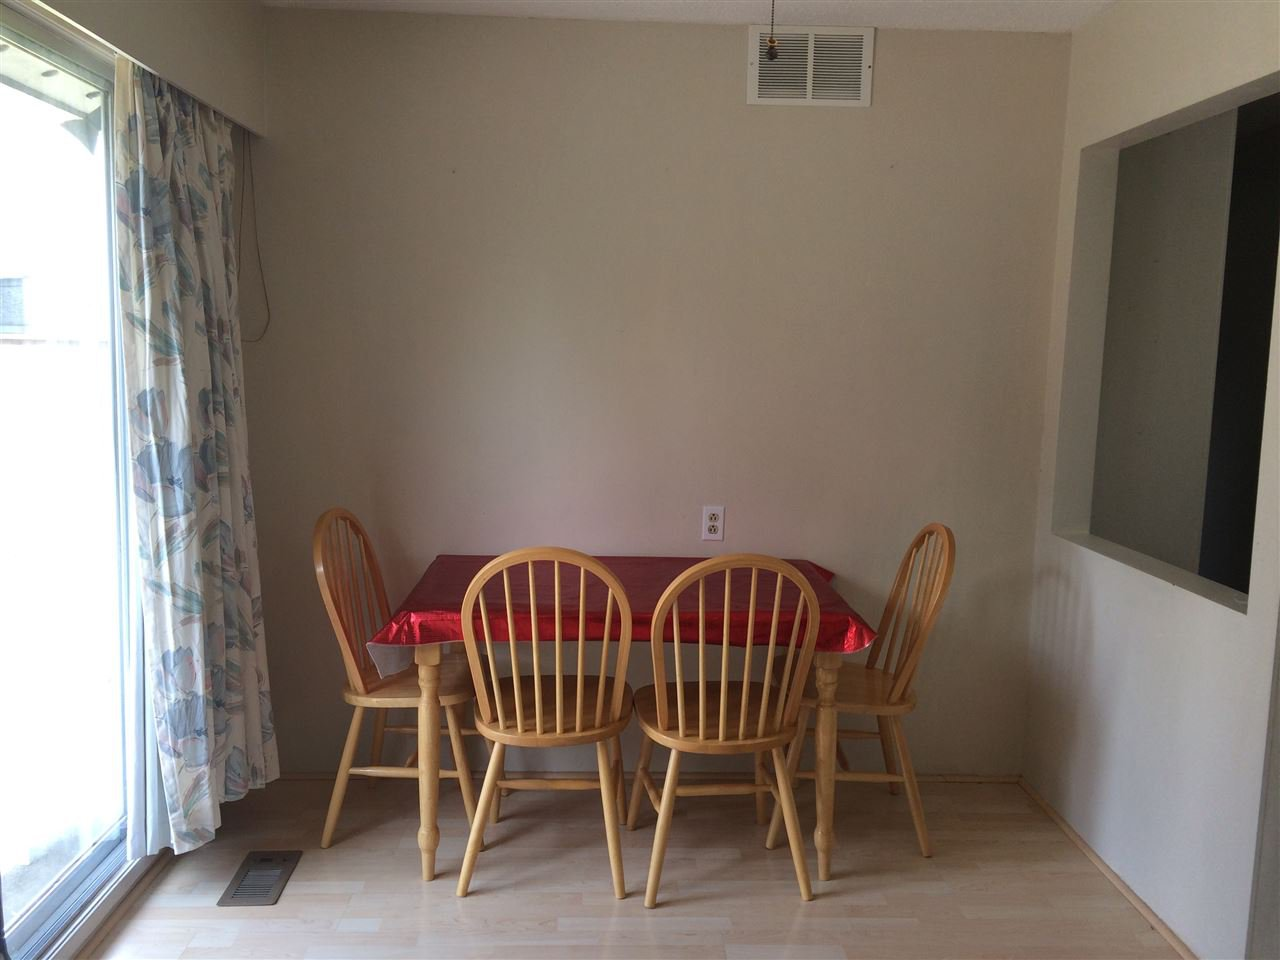 Photo 5: Photos: 12361 BONSON Road in Pitt Meadows: Mid Meadows House for sale : MLS®# R2078094